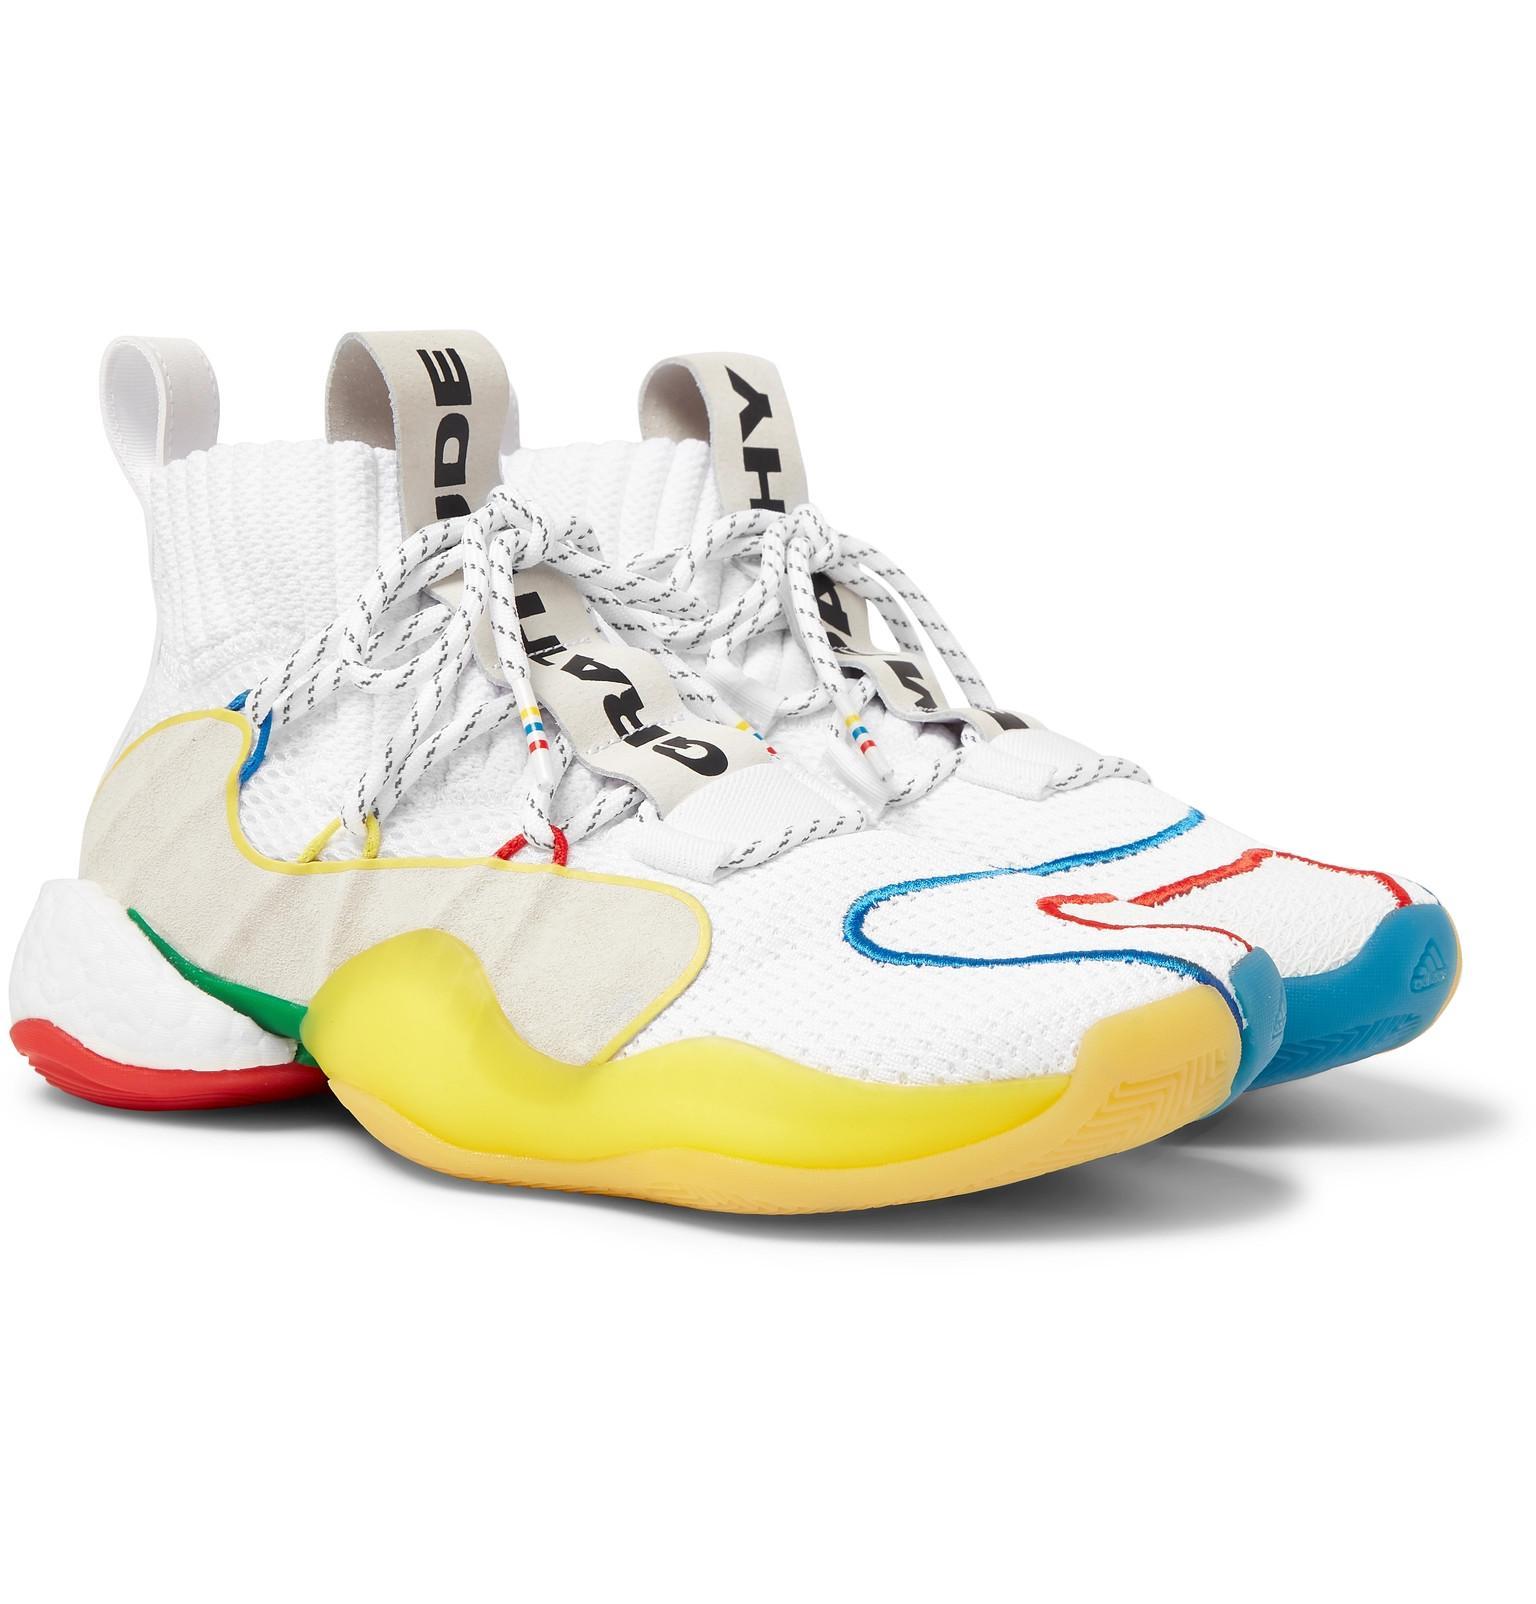 cb2a212b4 adidas Originals + Pharrell Williams Crazy Byw Lvl X Mesh Sneakers ...